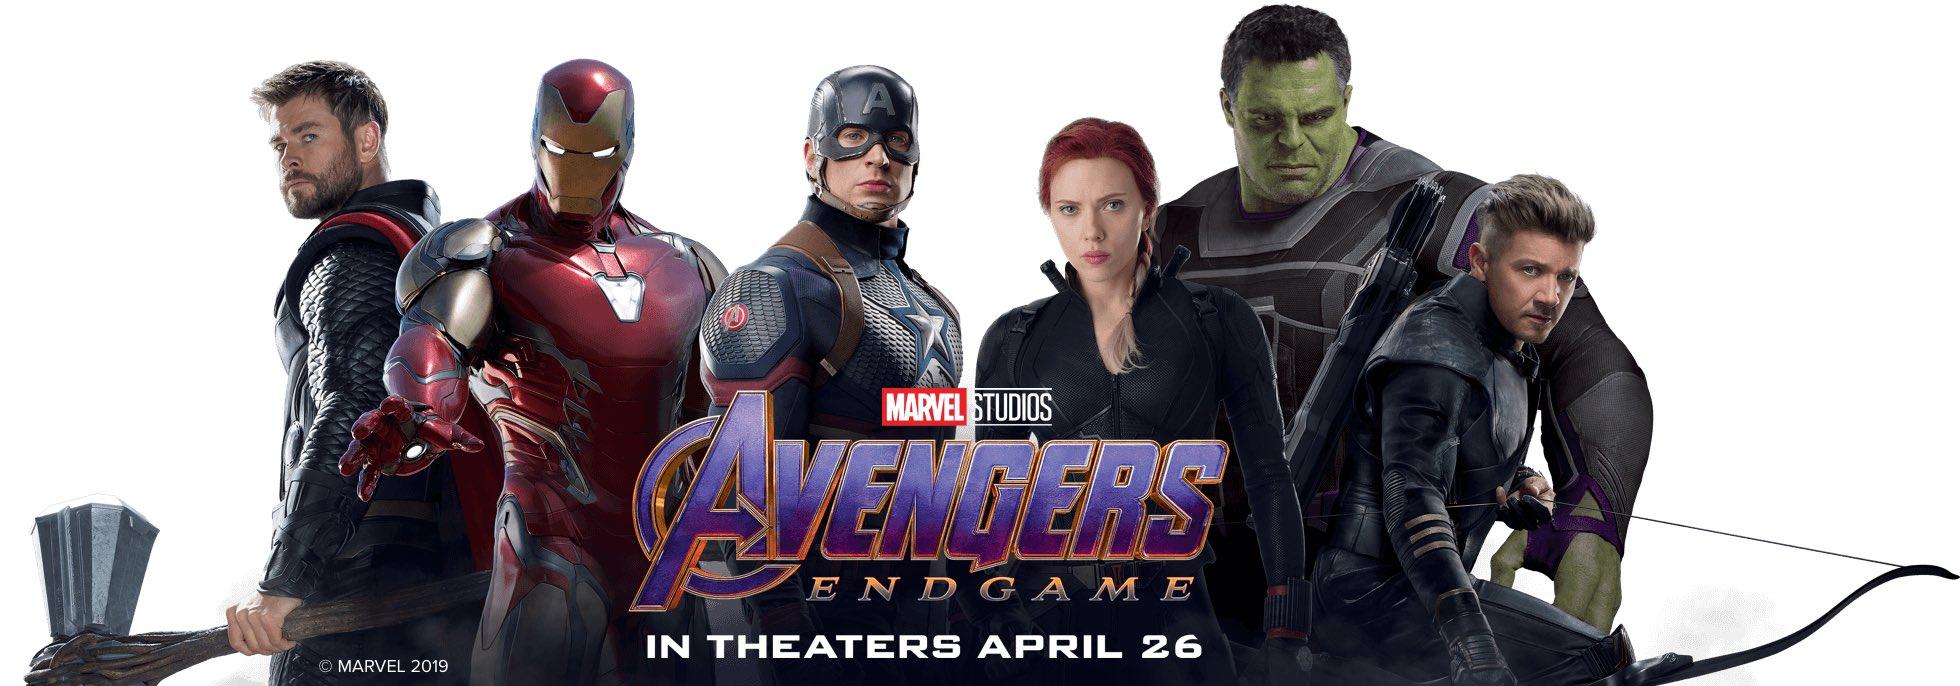 #Avengers #AvengersAgeOfUltron #AvengersInfinityWar #AvengersEndgame its all been leading to this! https://t.co/lK5znbXYUm